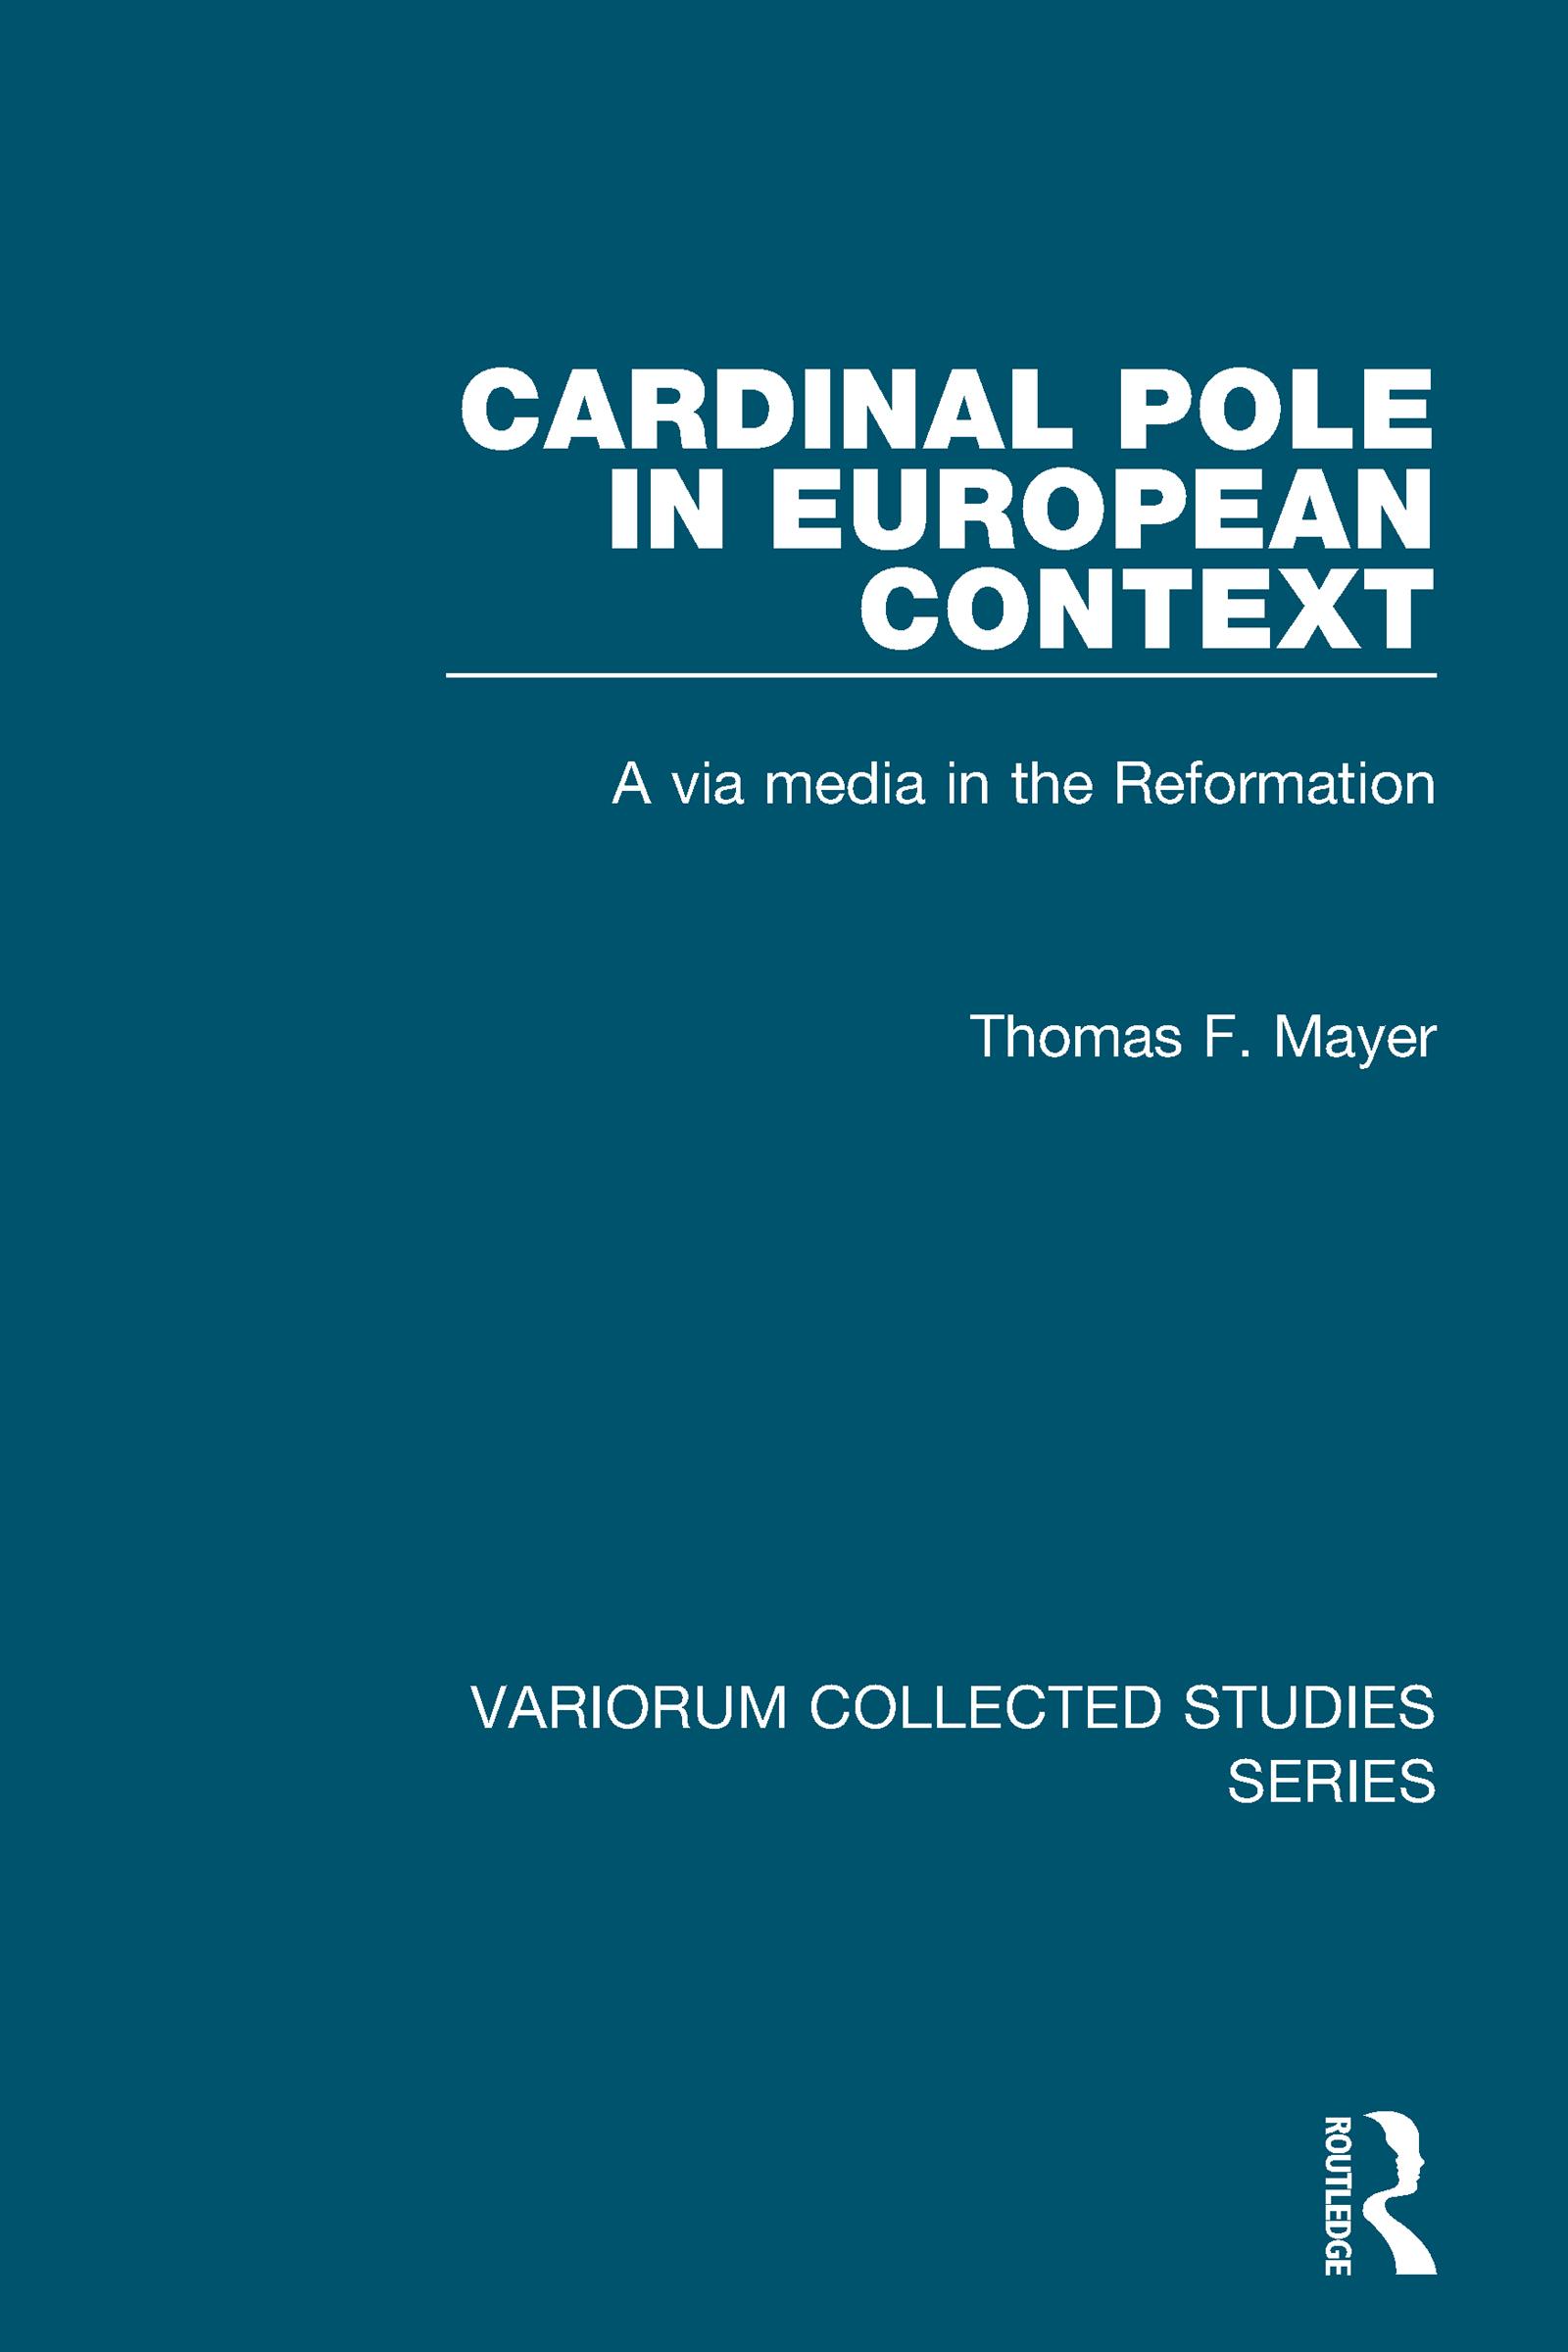 Cardinal Pole in European Context: A via media in the Reformation book cover